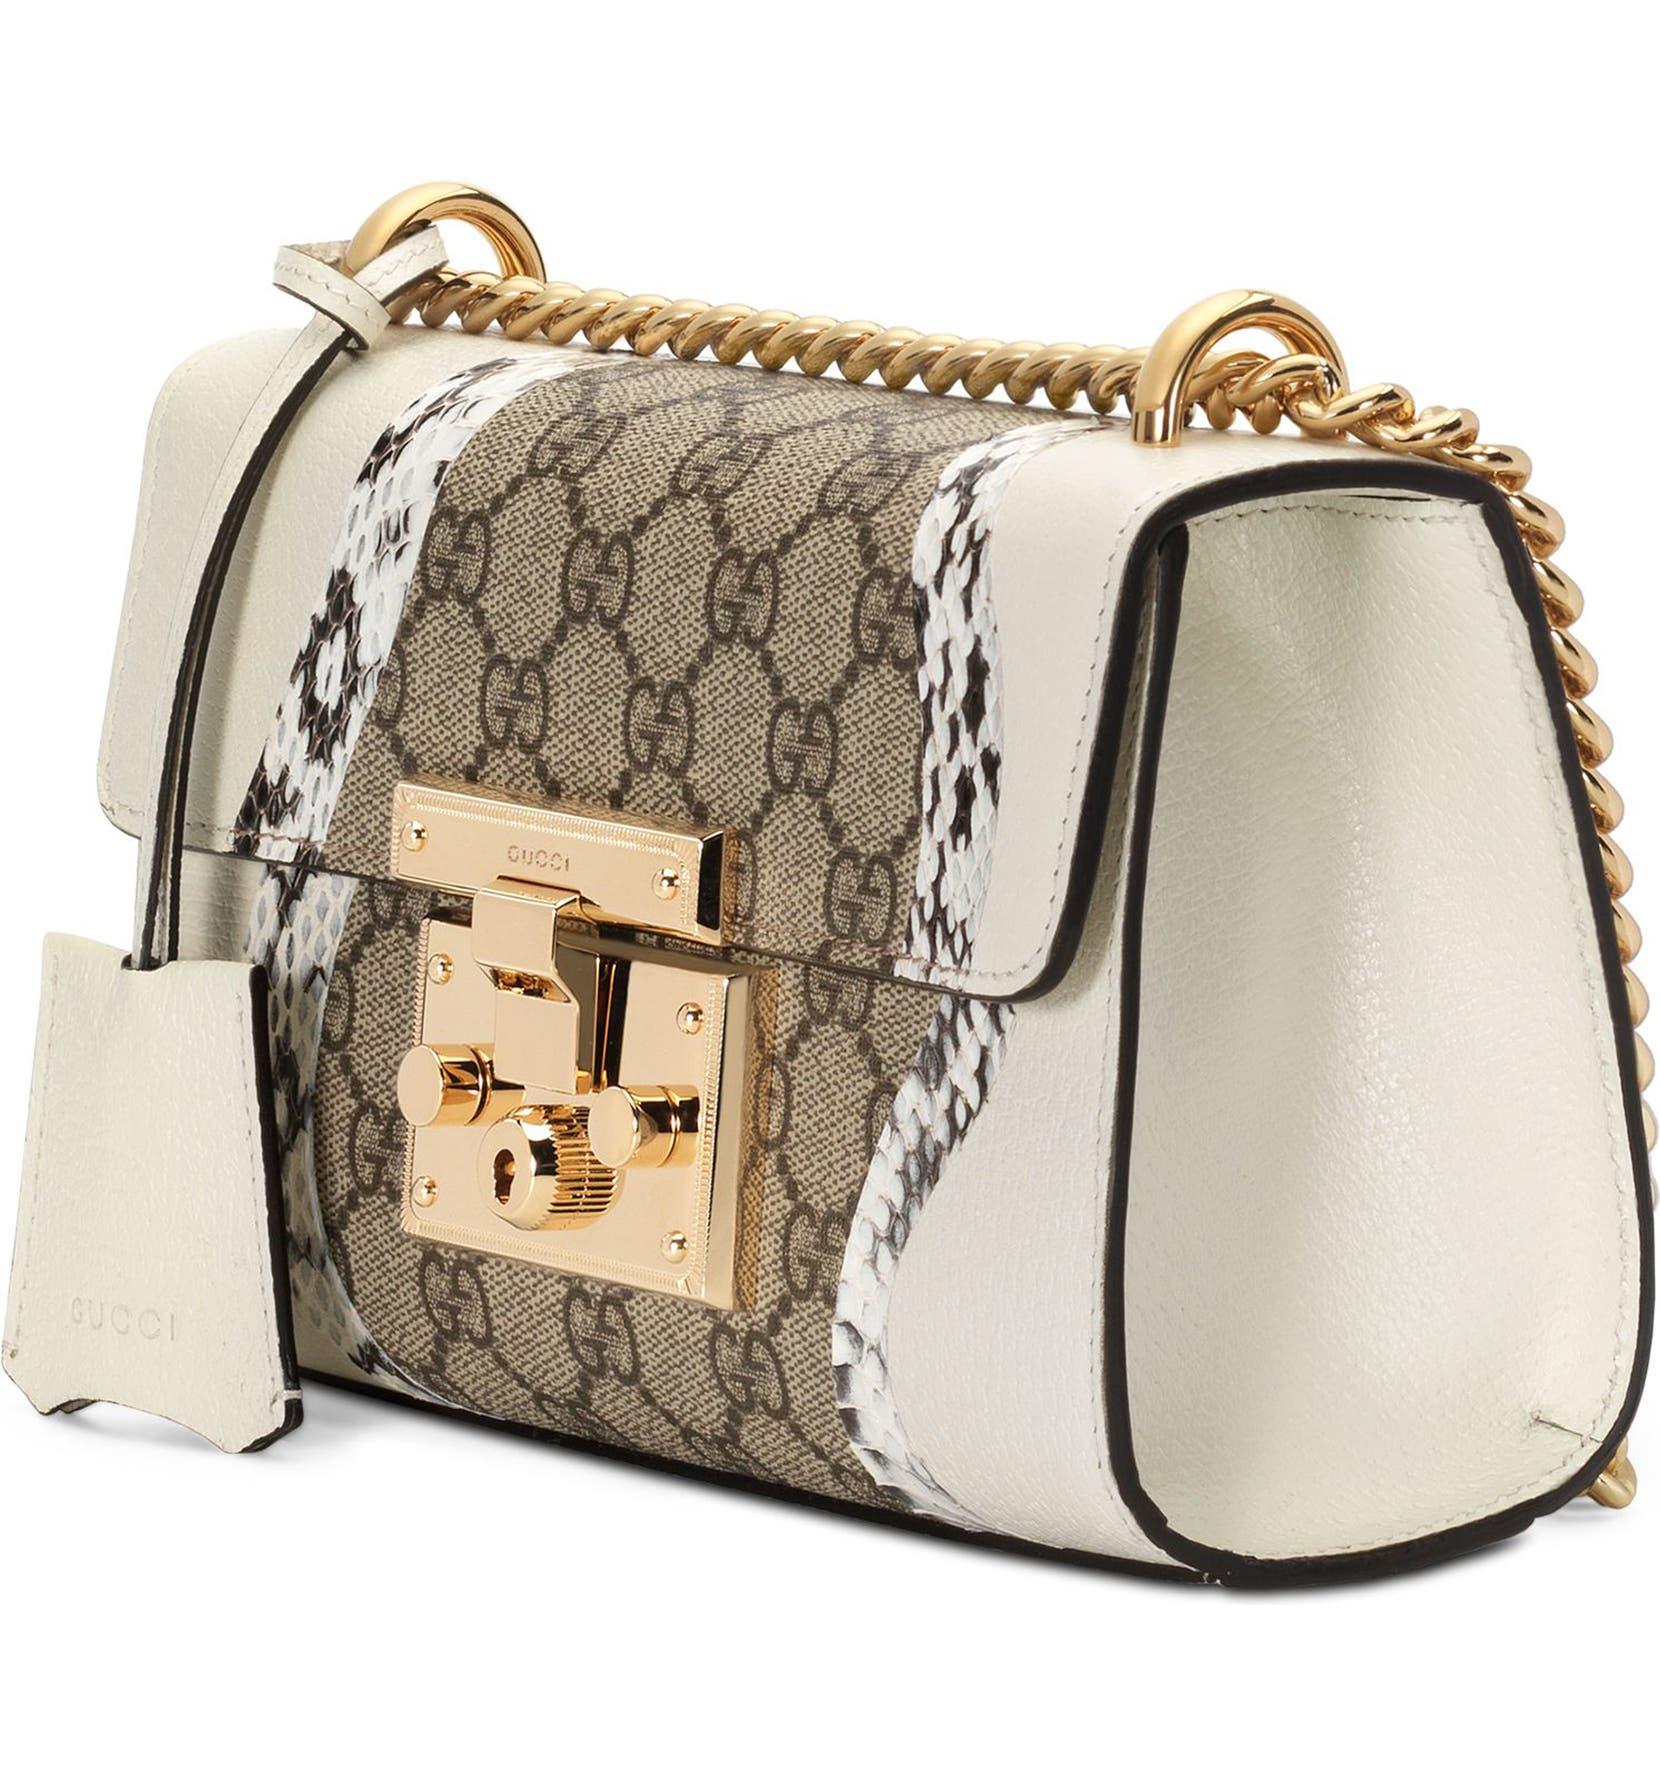 4a3f16ae6 Gucci Small Padlock GG Supreme Wave Shoulder Bag with Genuine Snakeskin Trim  | Nordstrom